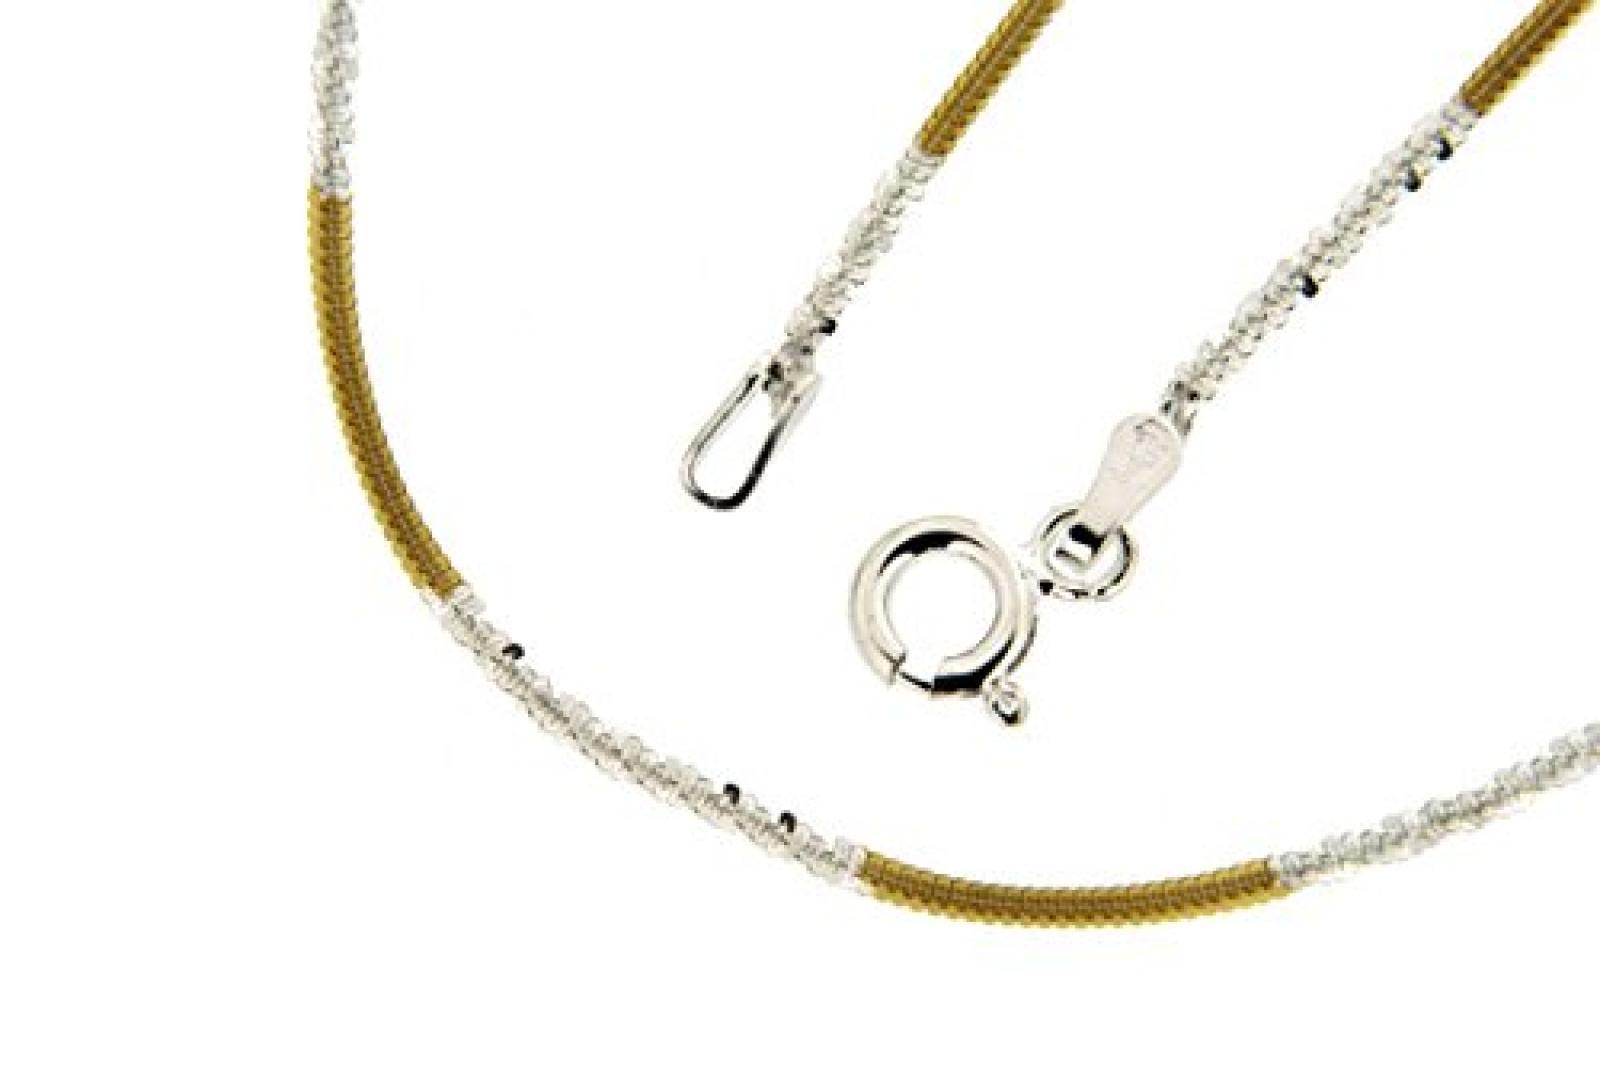 Kettenworld Damen-Halskette im Criss-Cross-Design 925 Sterling Silber bicolor 282430